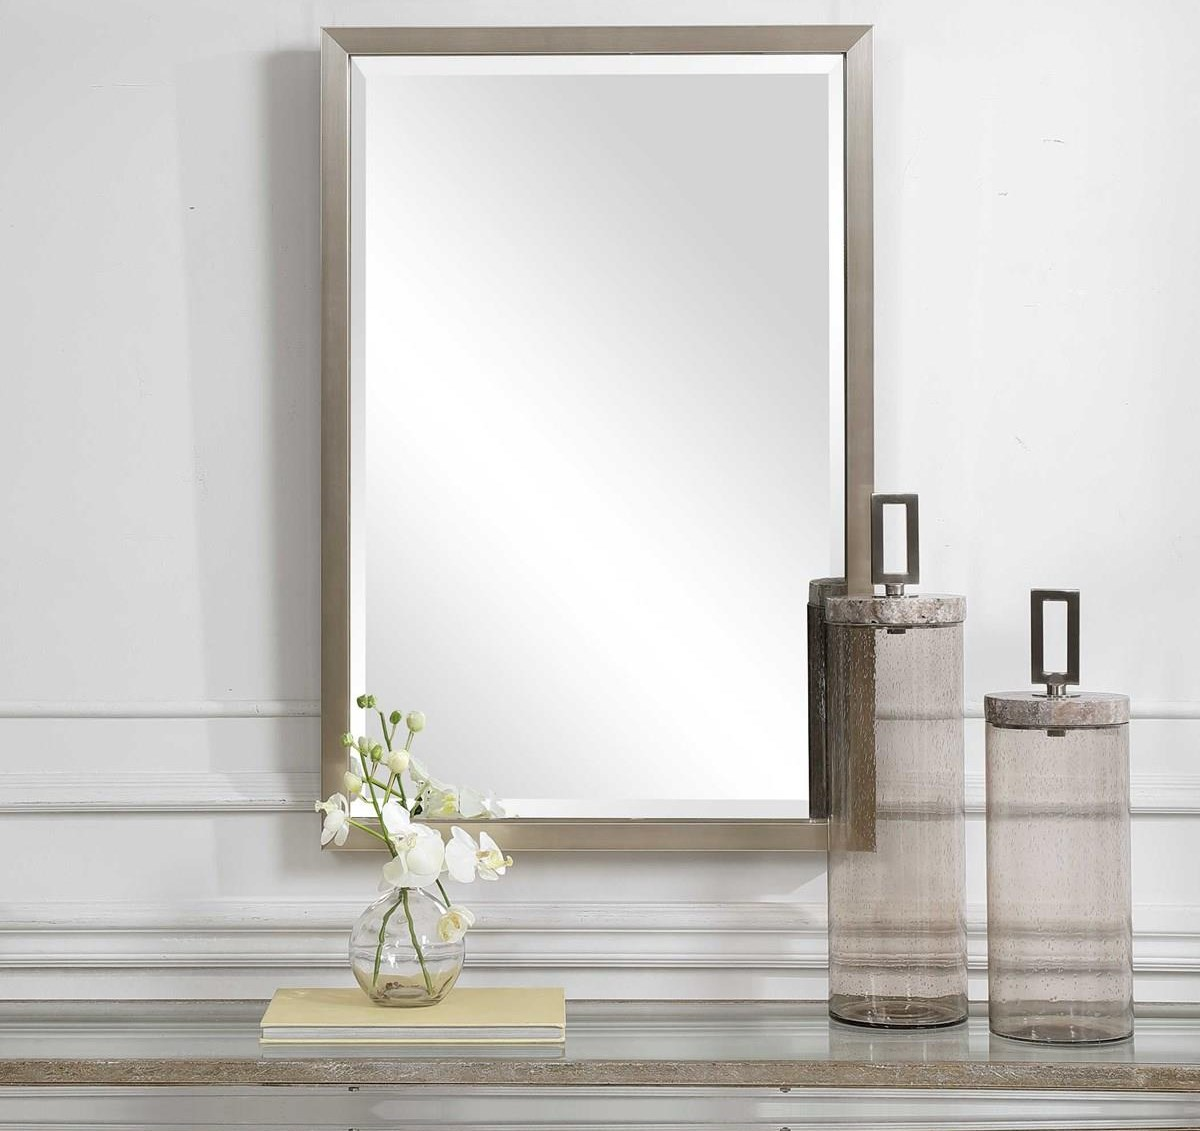 Mirrors GABRIELLA WALL MIRROR by Unique at Walker's Furniture